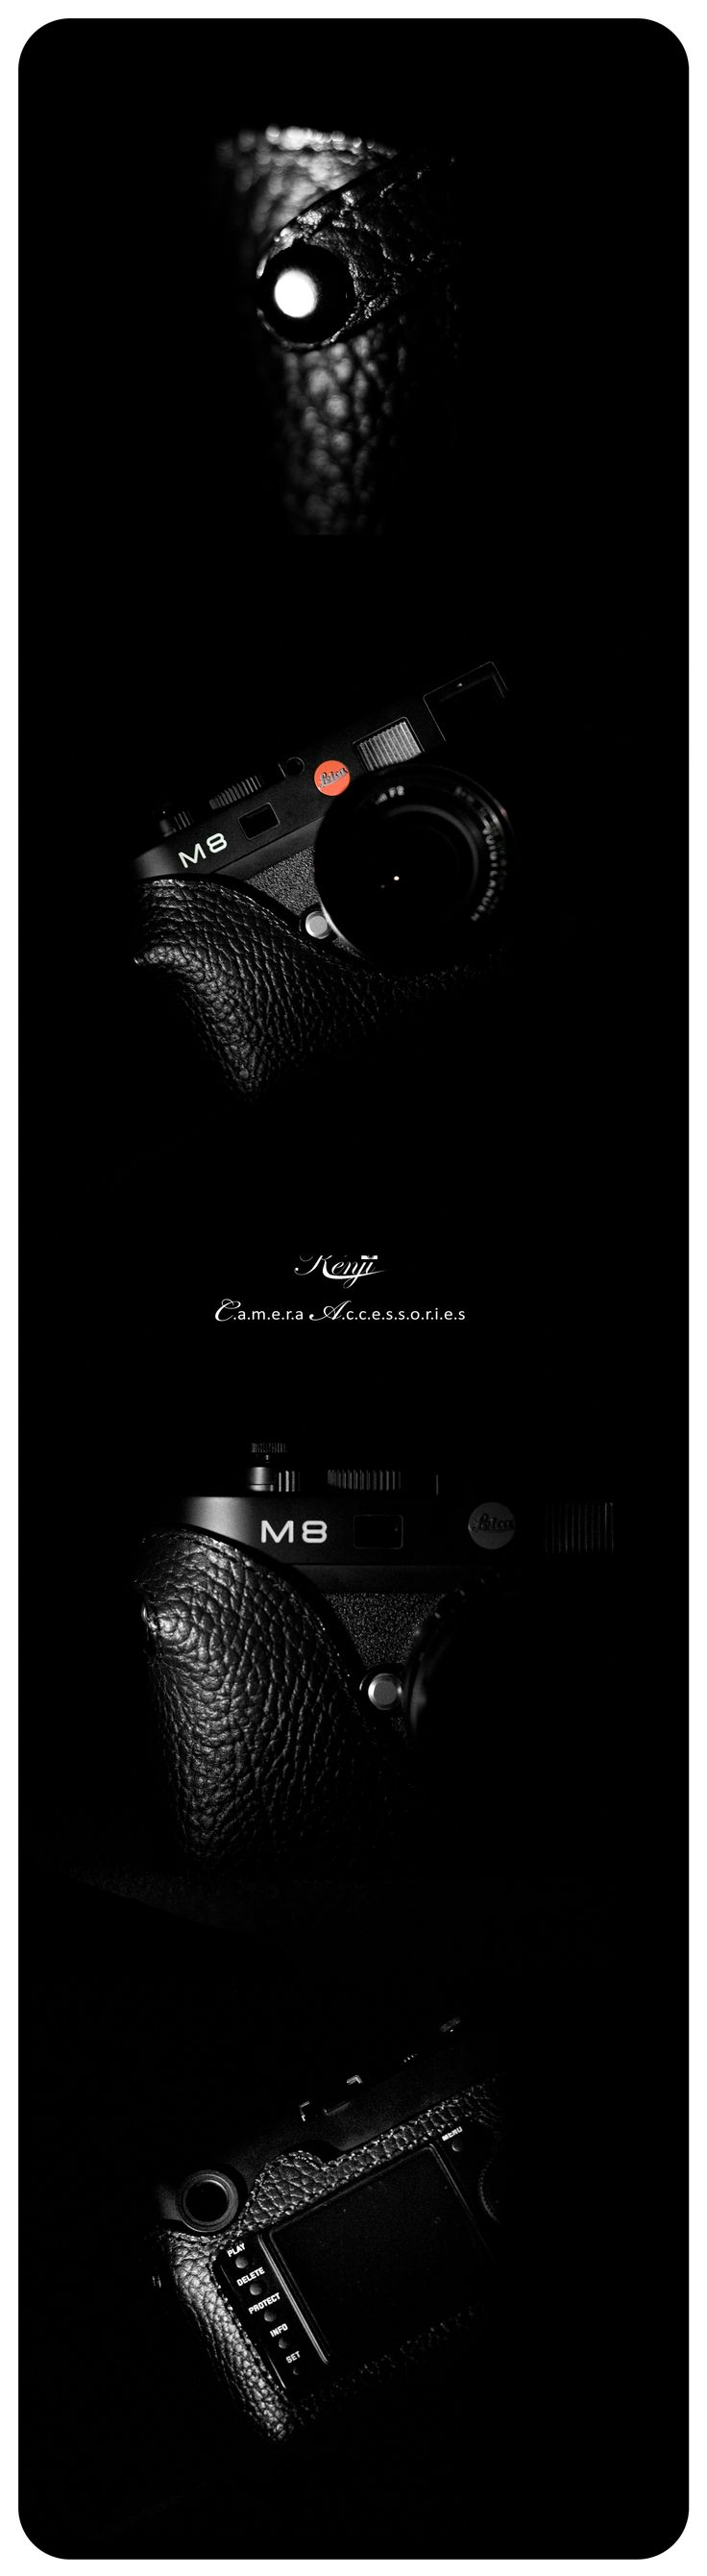 Leica M8 with kenjileather espresso halfcase